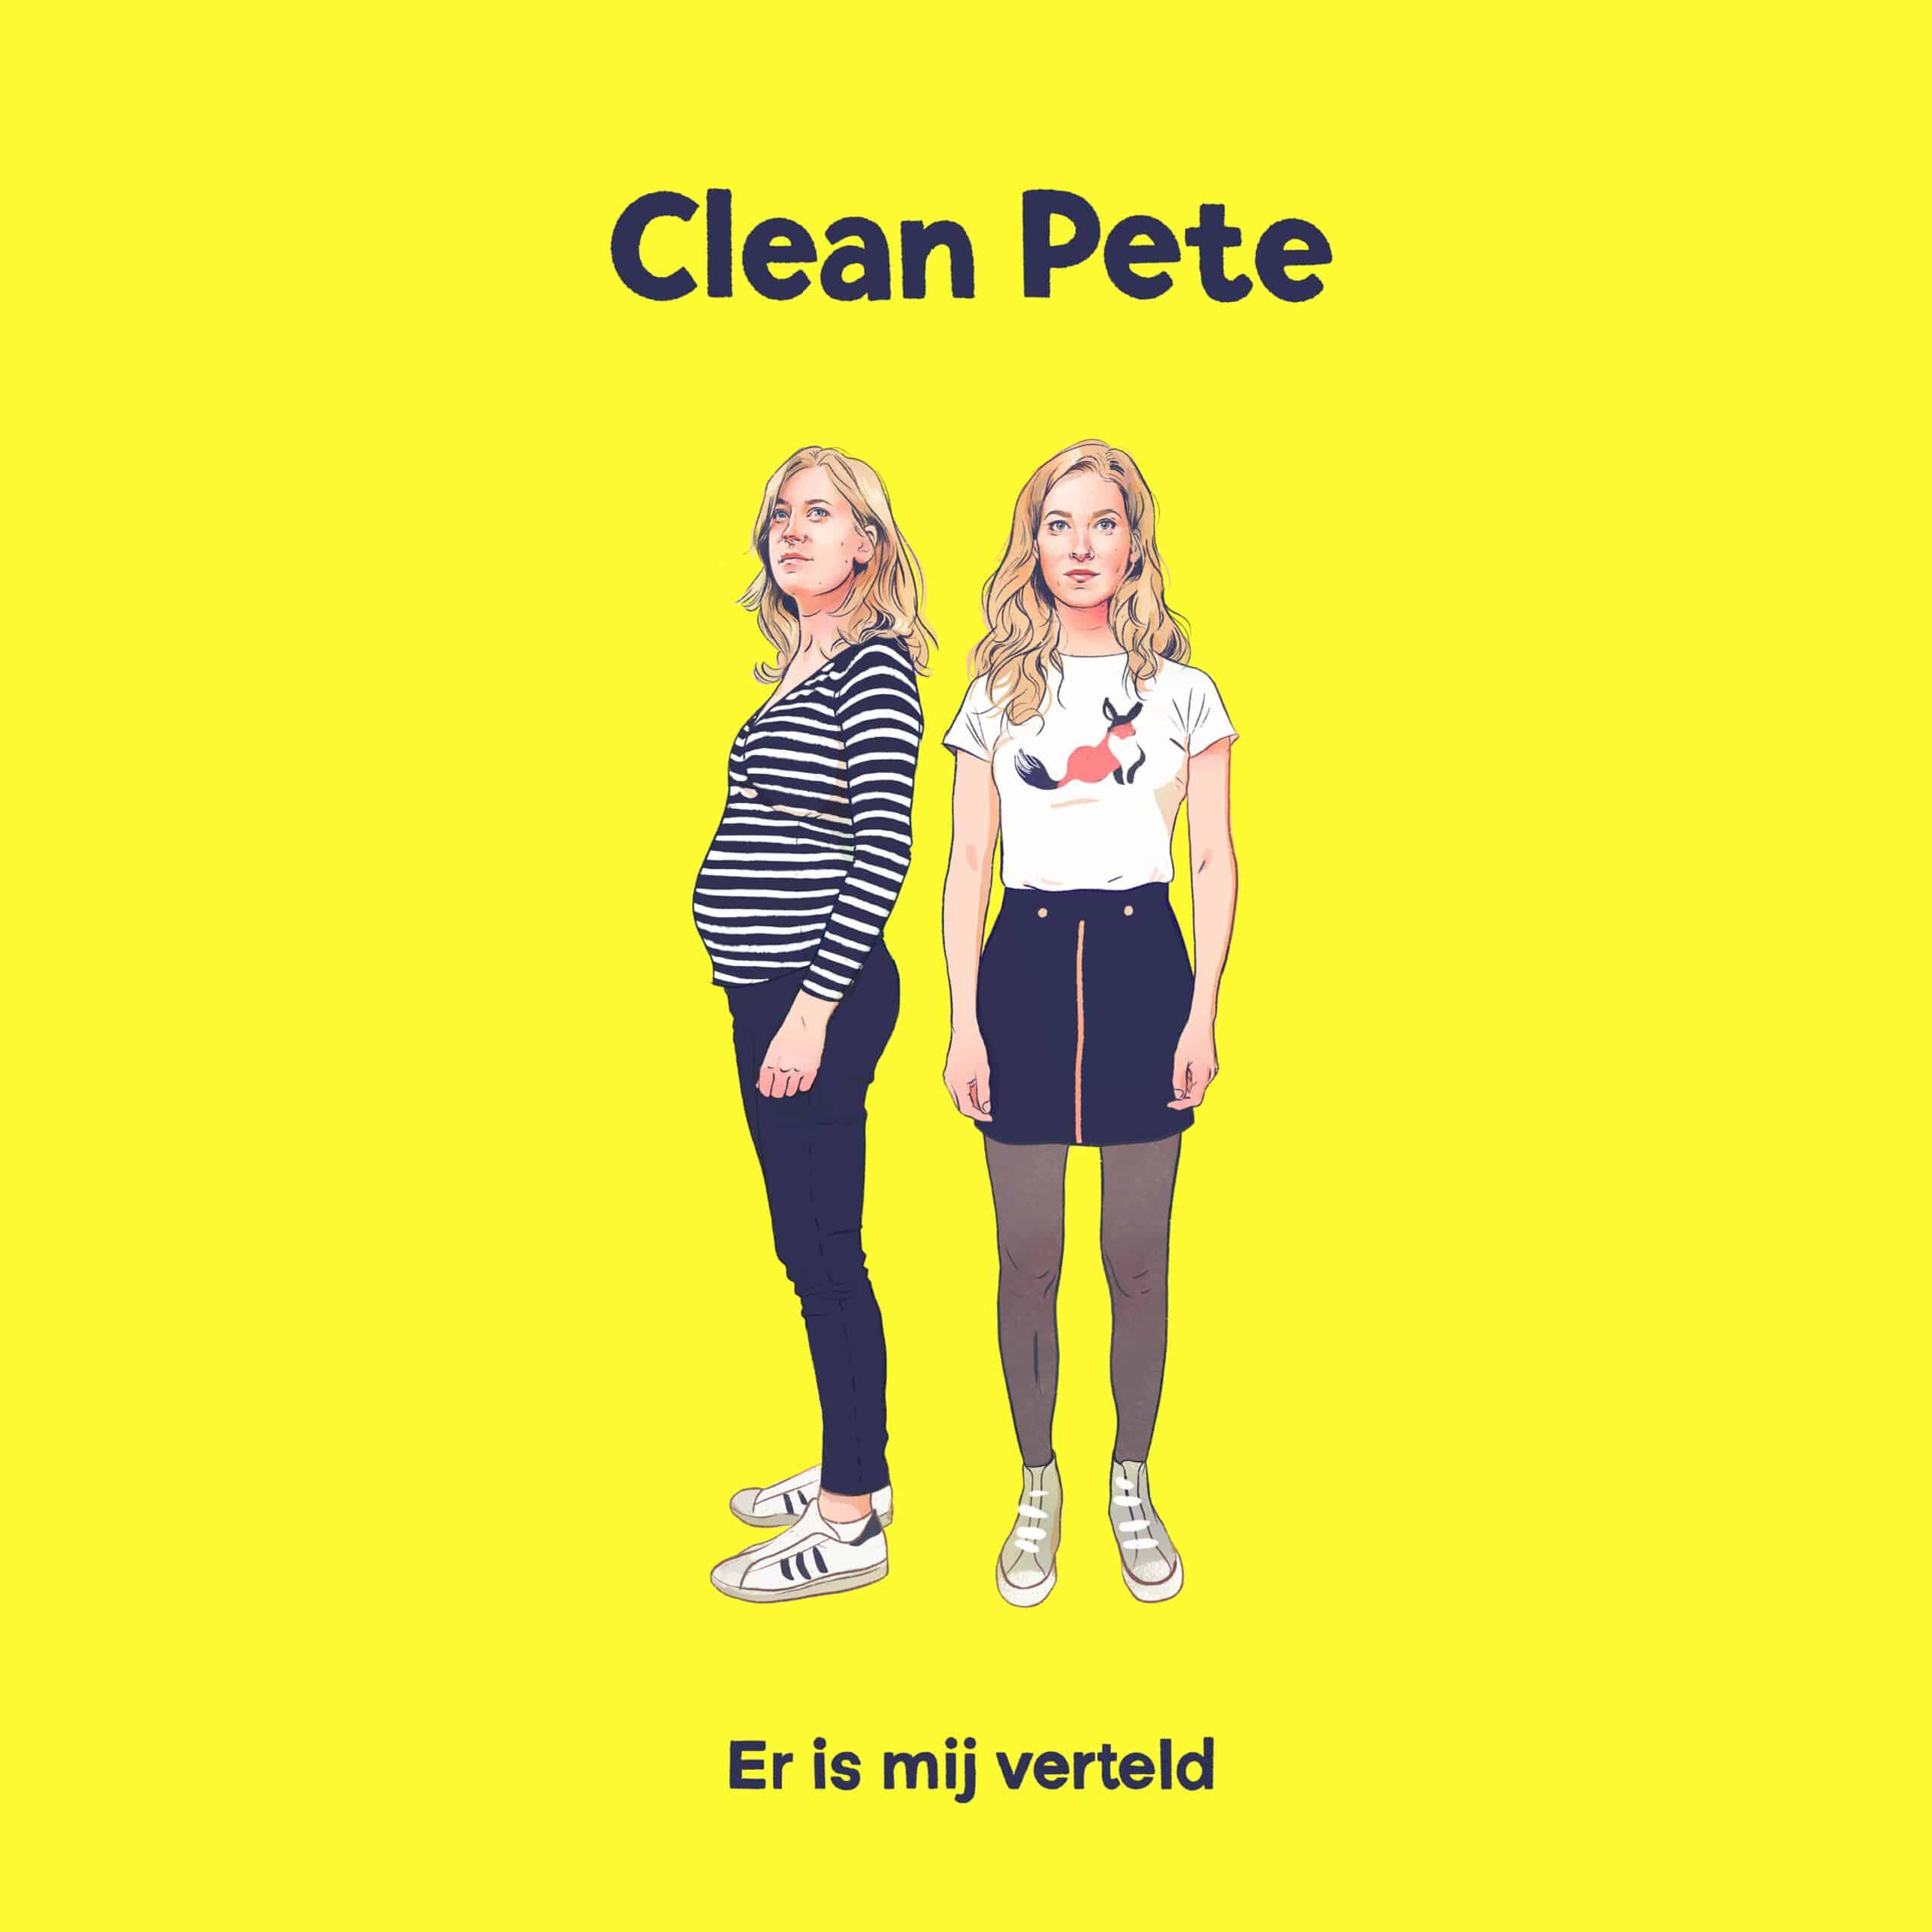 Clean Pete